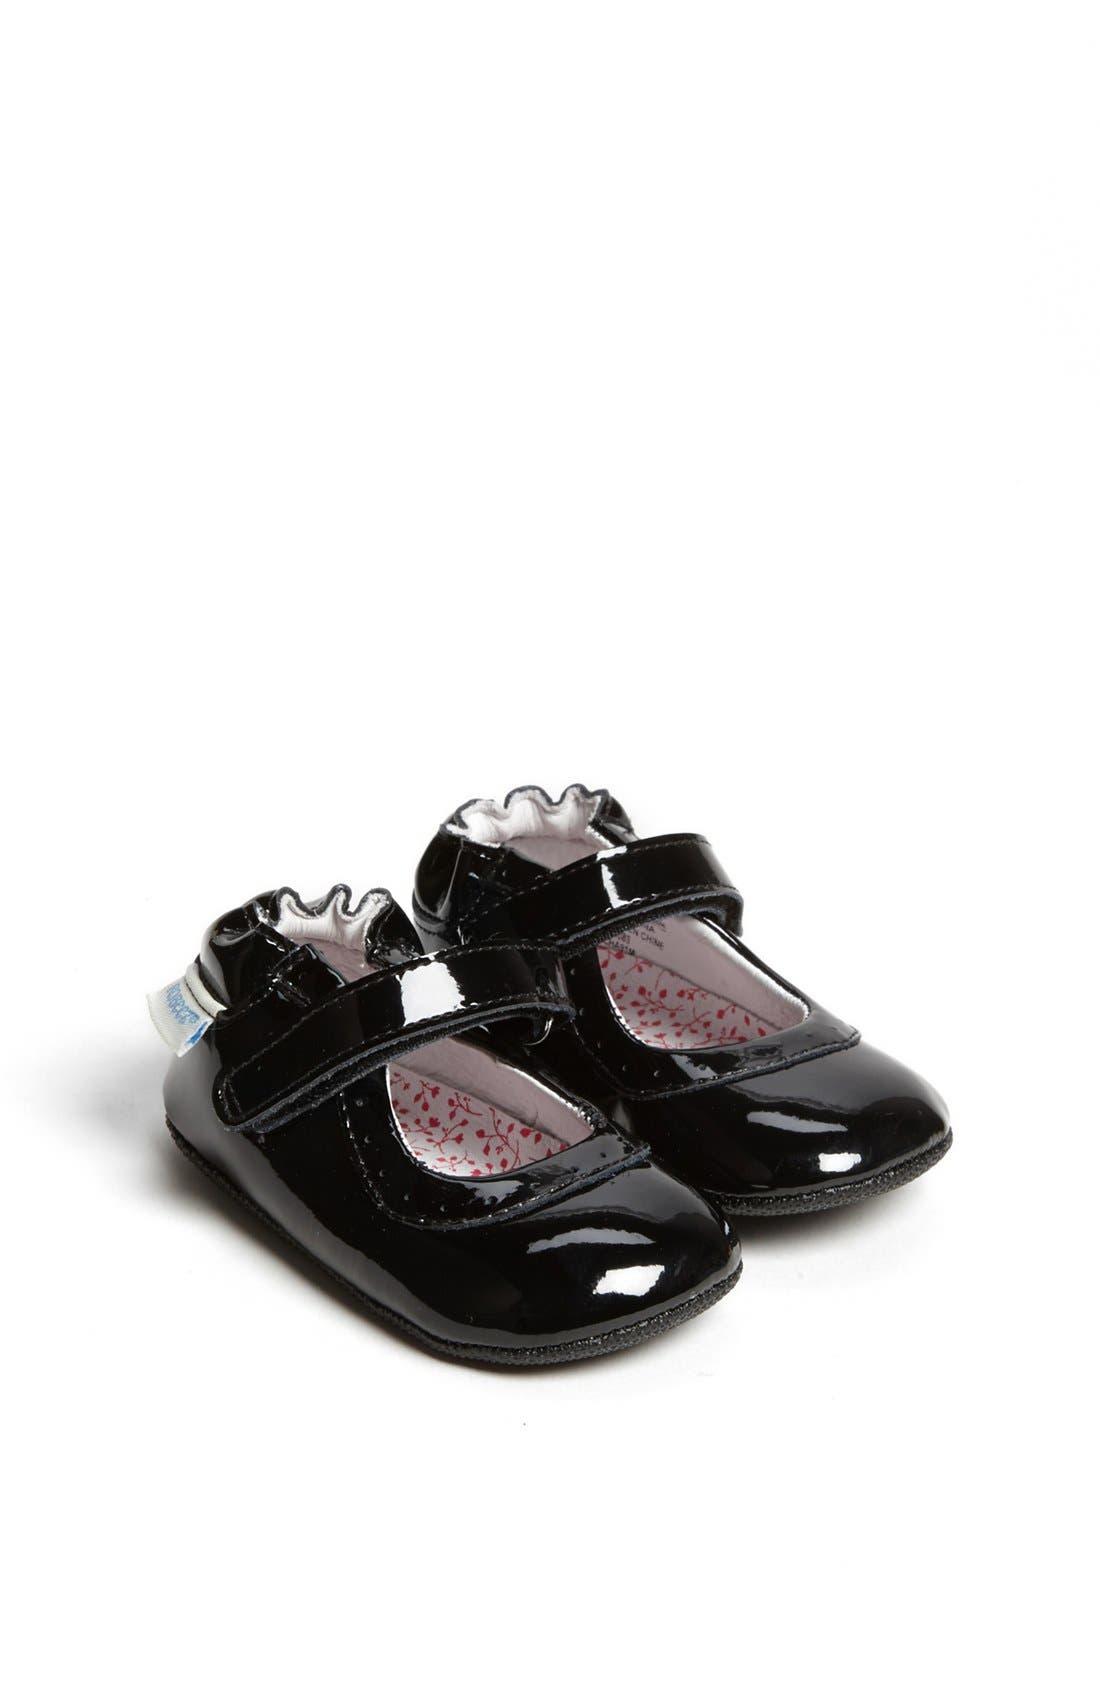 Alternate Image 1 Selected - Robeez® Mini Shoez 'Gracie' Mary Jane (Baby & Walker)